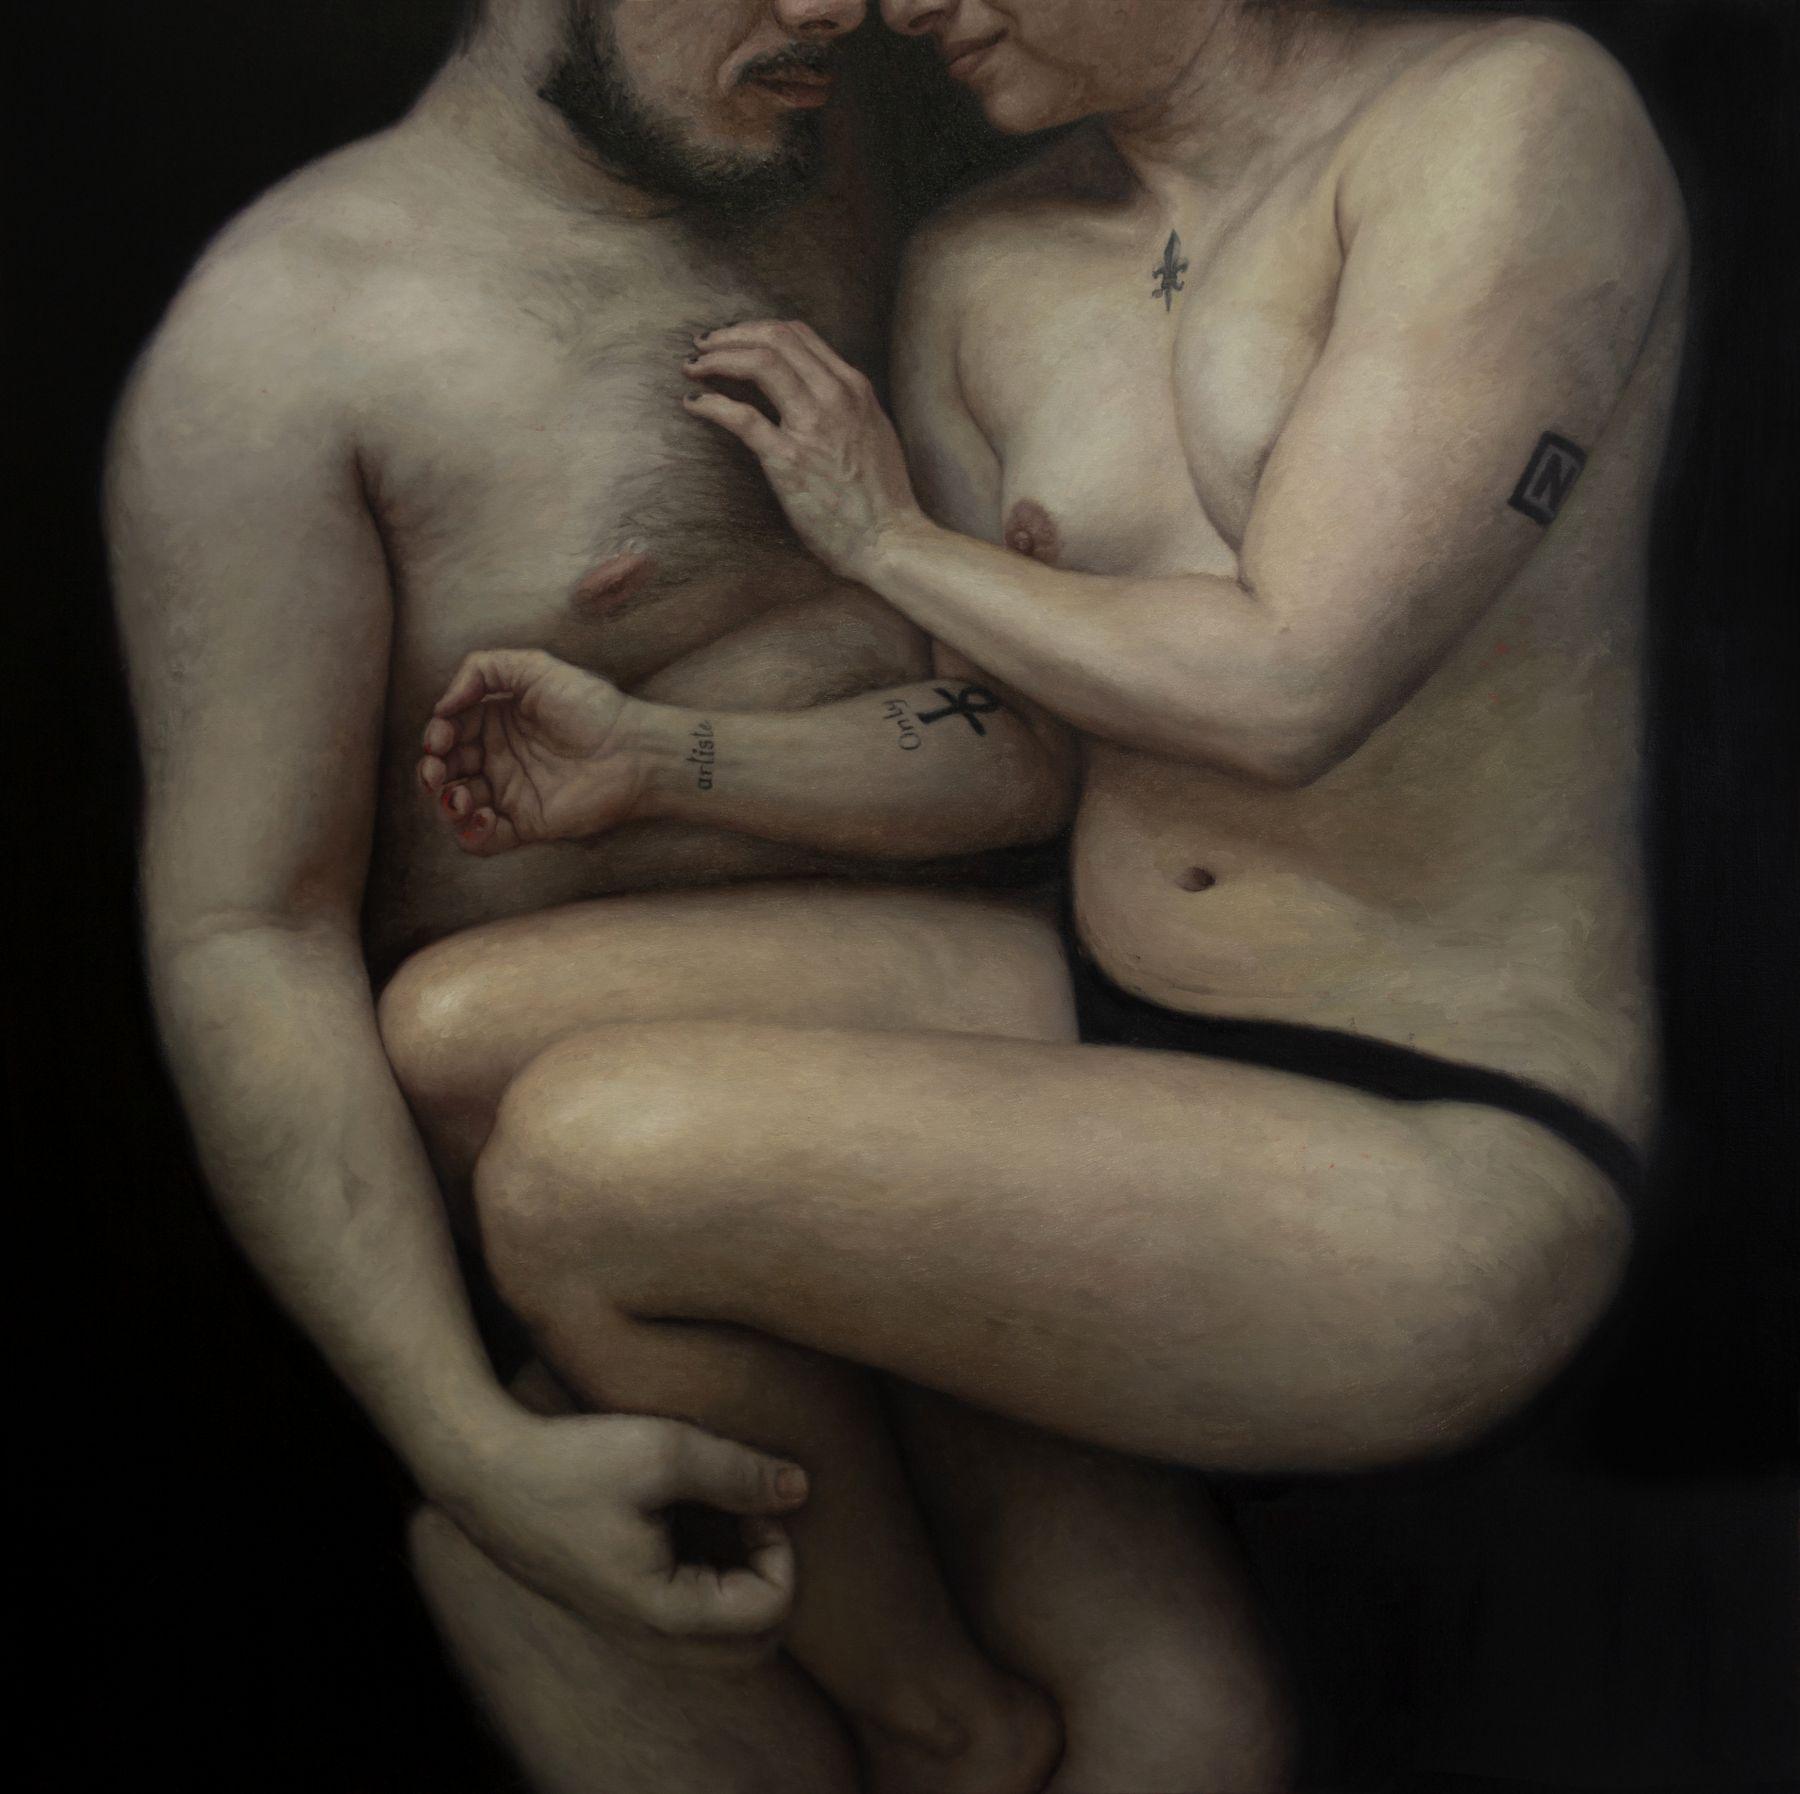 Couple (GZ2_Macro),  2019, Oil on canvas, 60 x 60 in / 152 x 152 cm